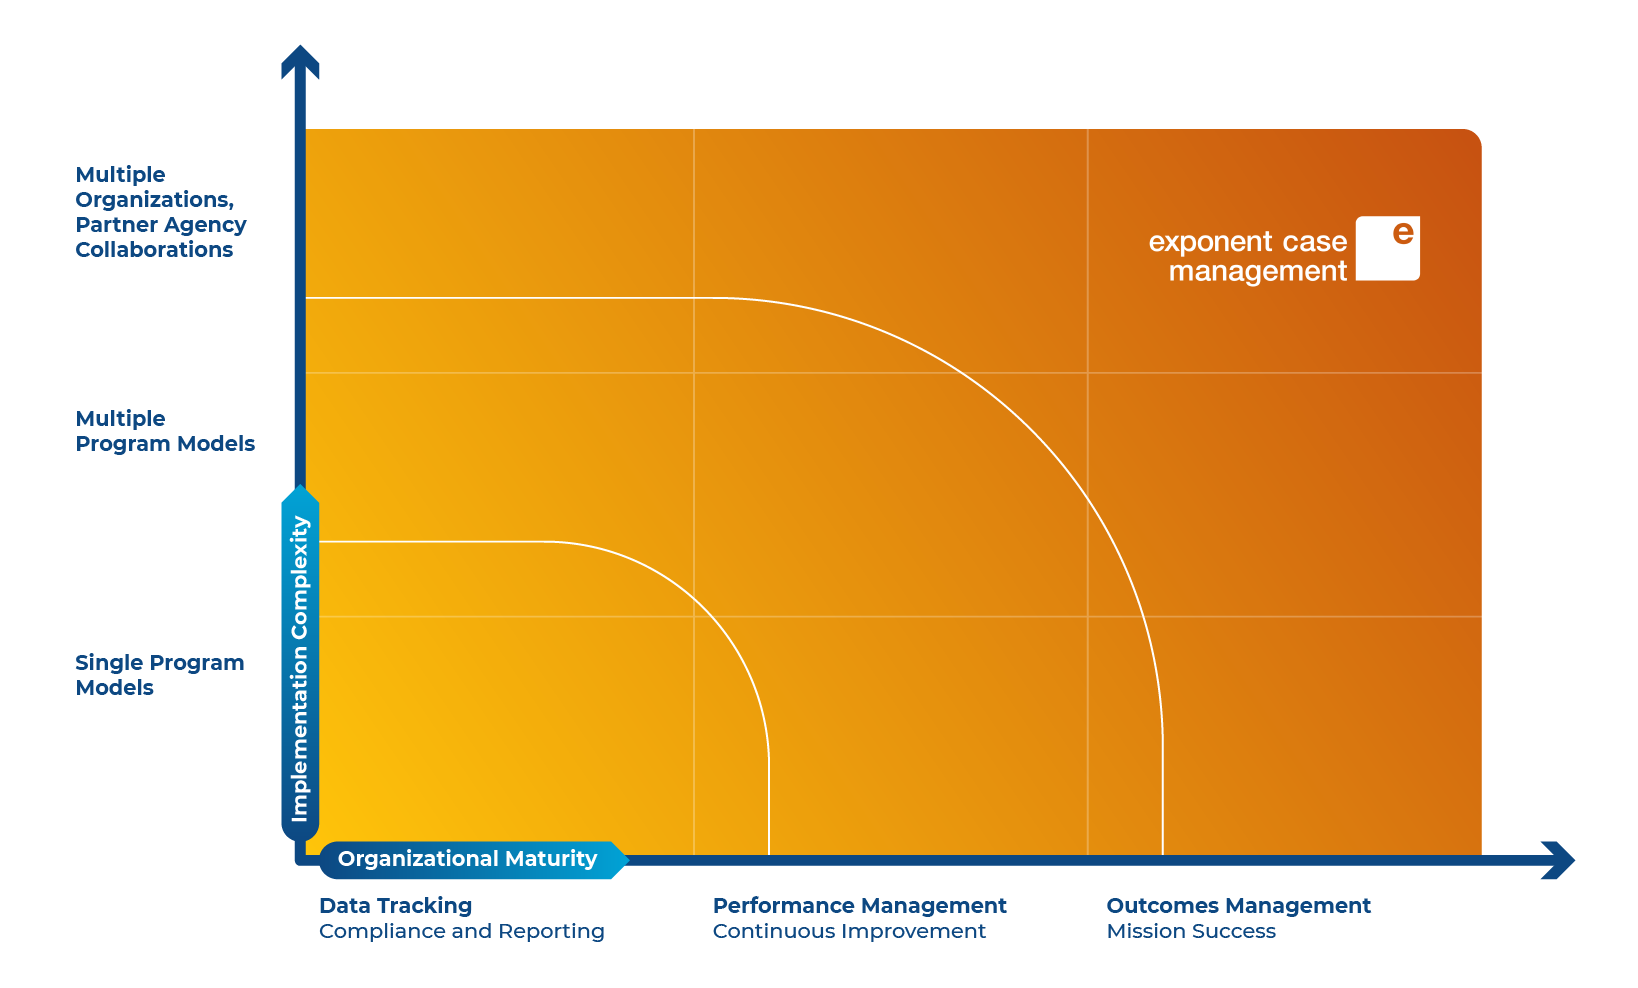 Matrix program management complexity by organizational maturity